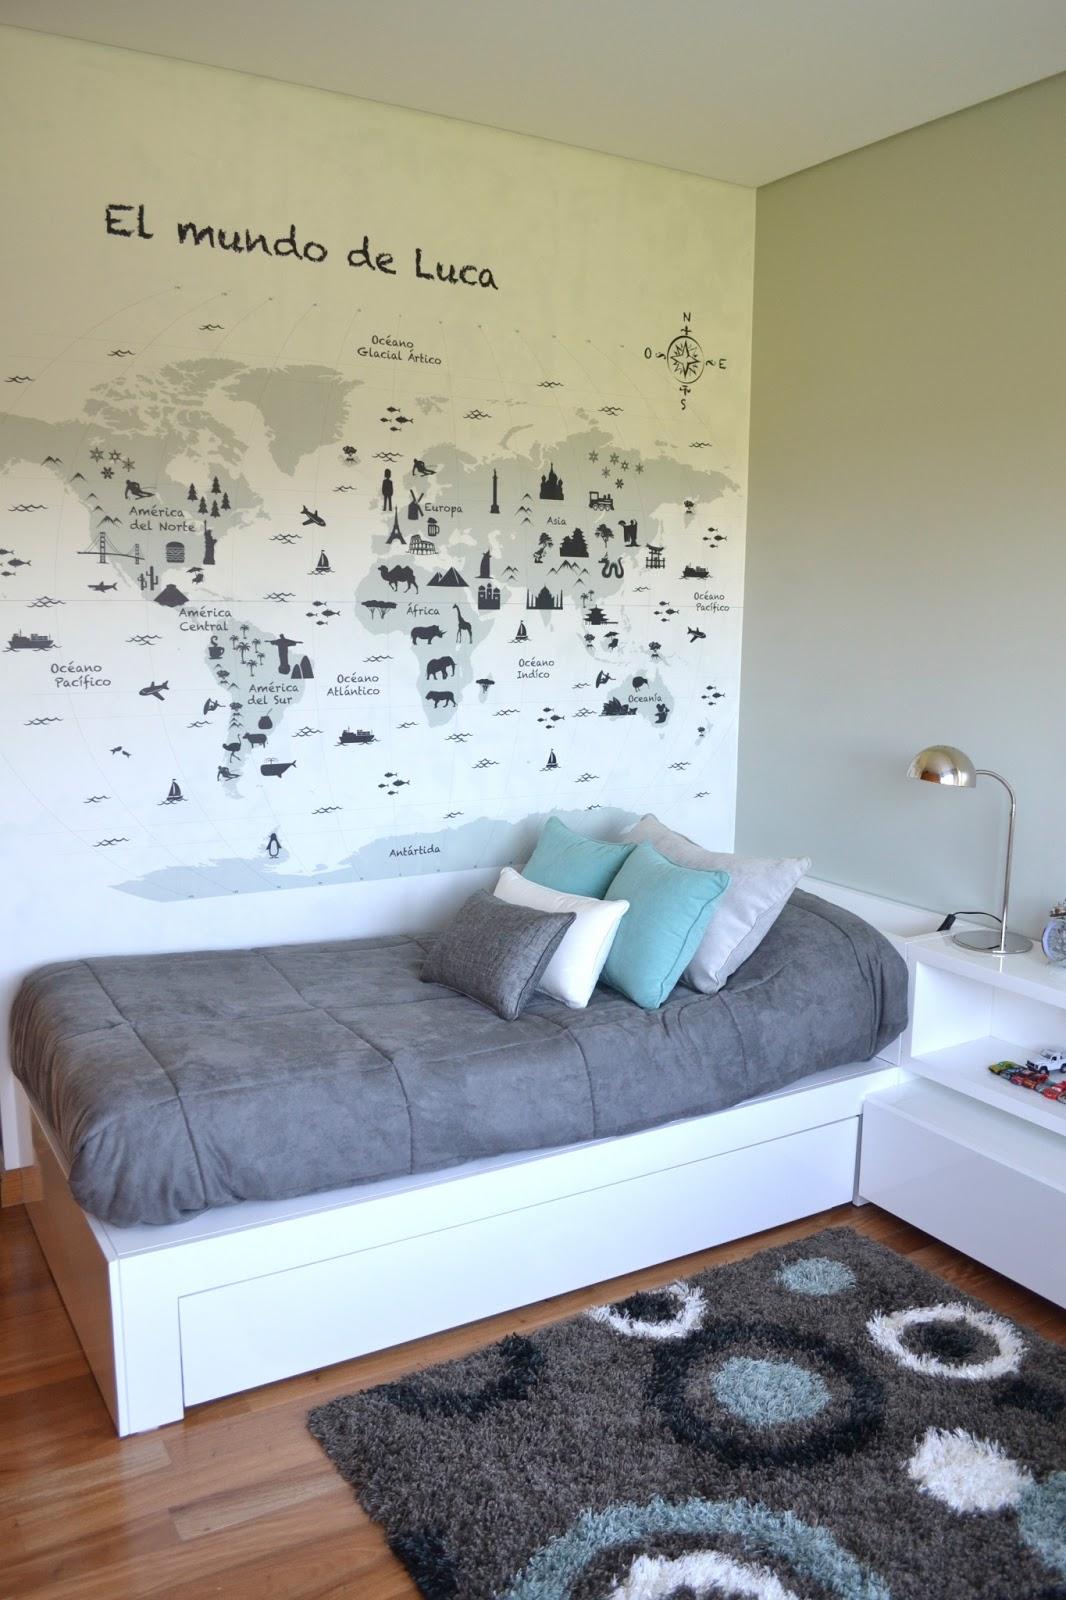 Estudio dulce cattaneo dise o de interiores proyecto for Decoracion interior habitacion